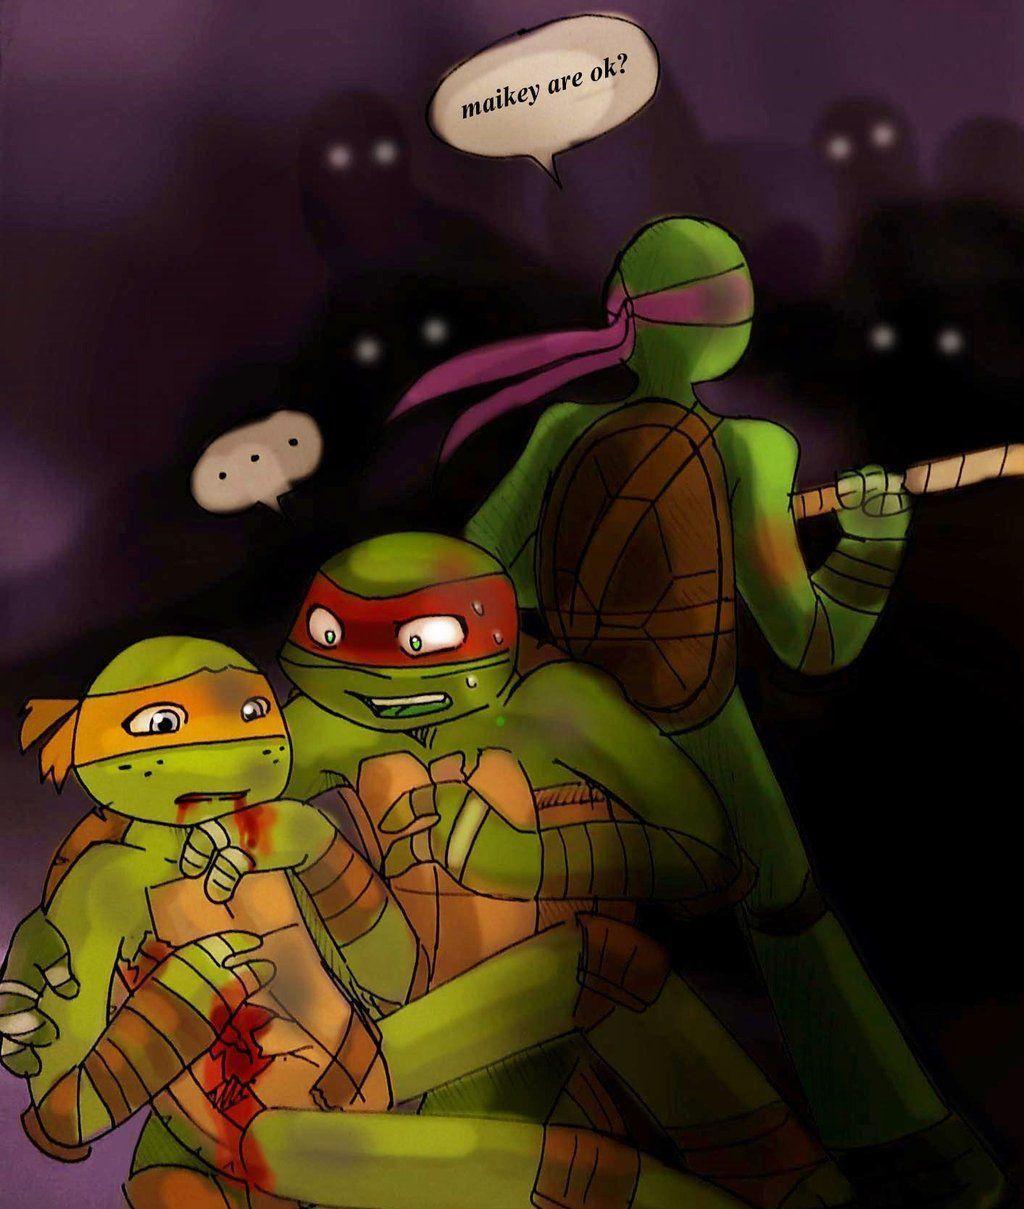 Yinller S Deviantart Gallery Teenage Mutant Ninja Turtles Artwork Tmnt Comics Tmnt Mikey